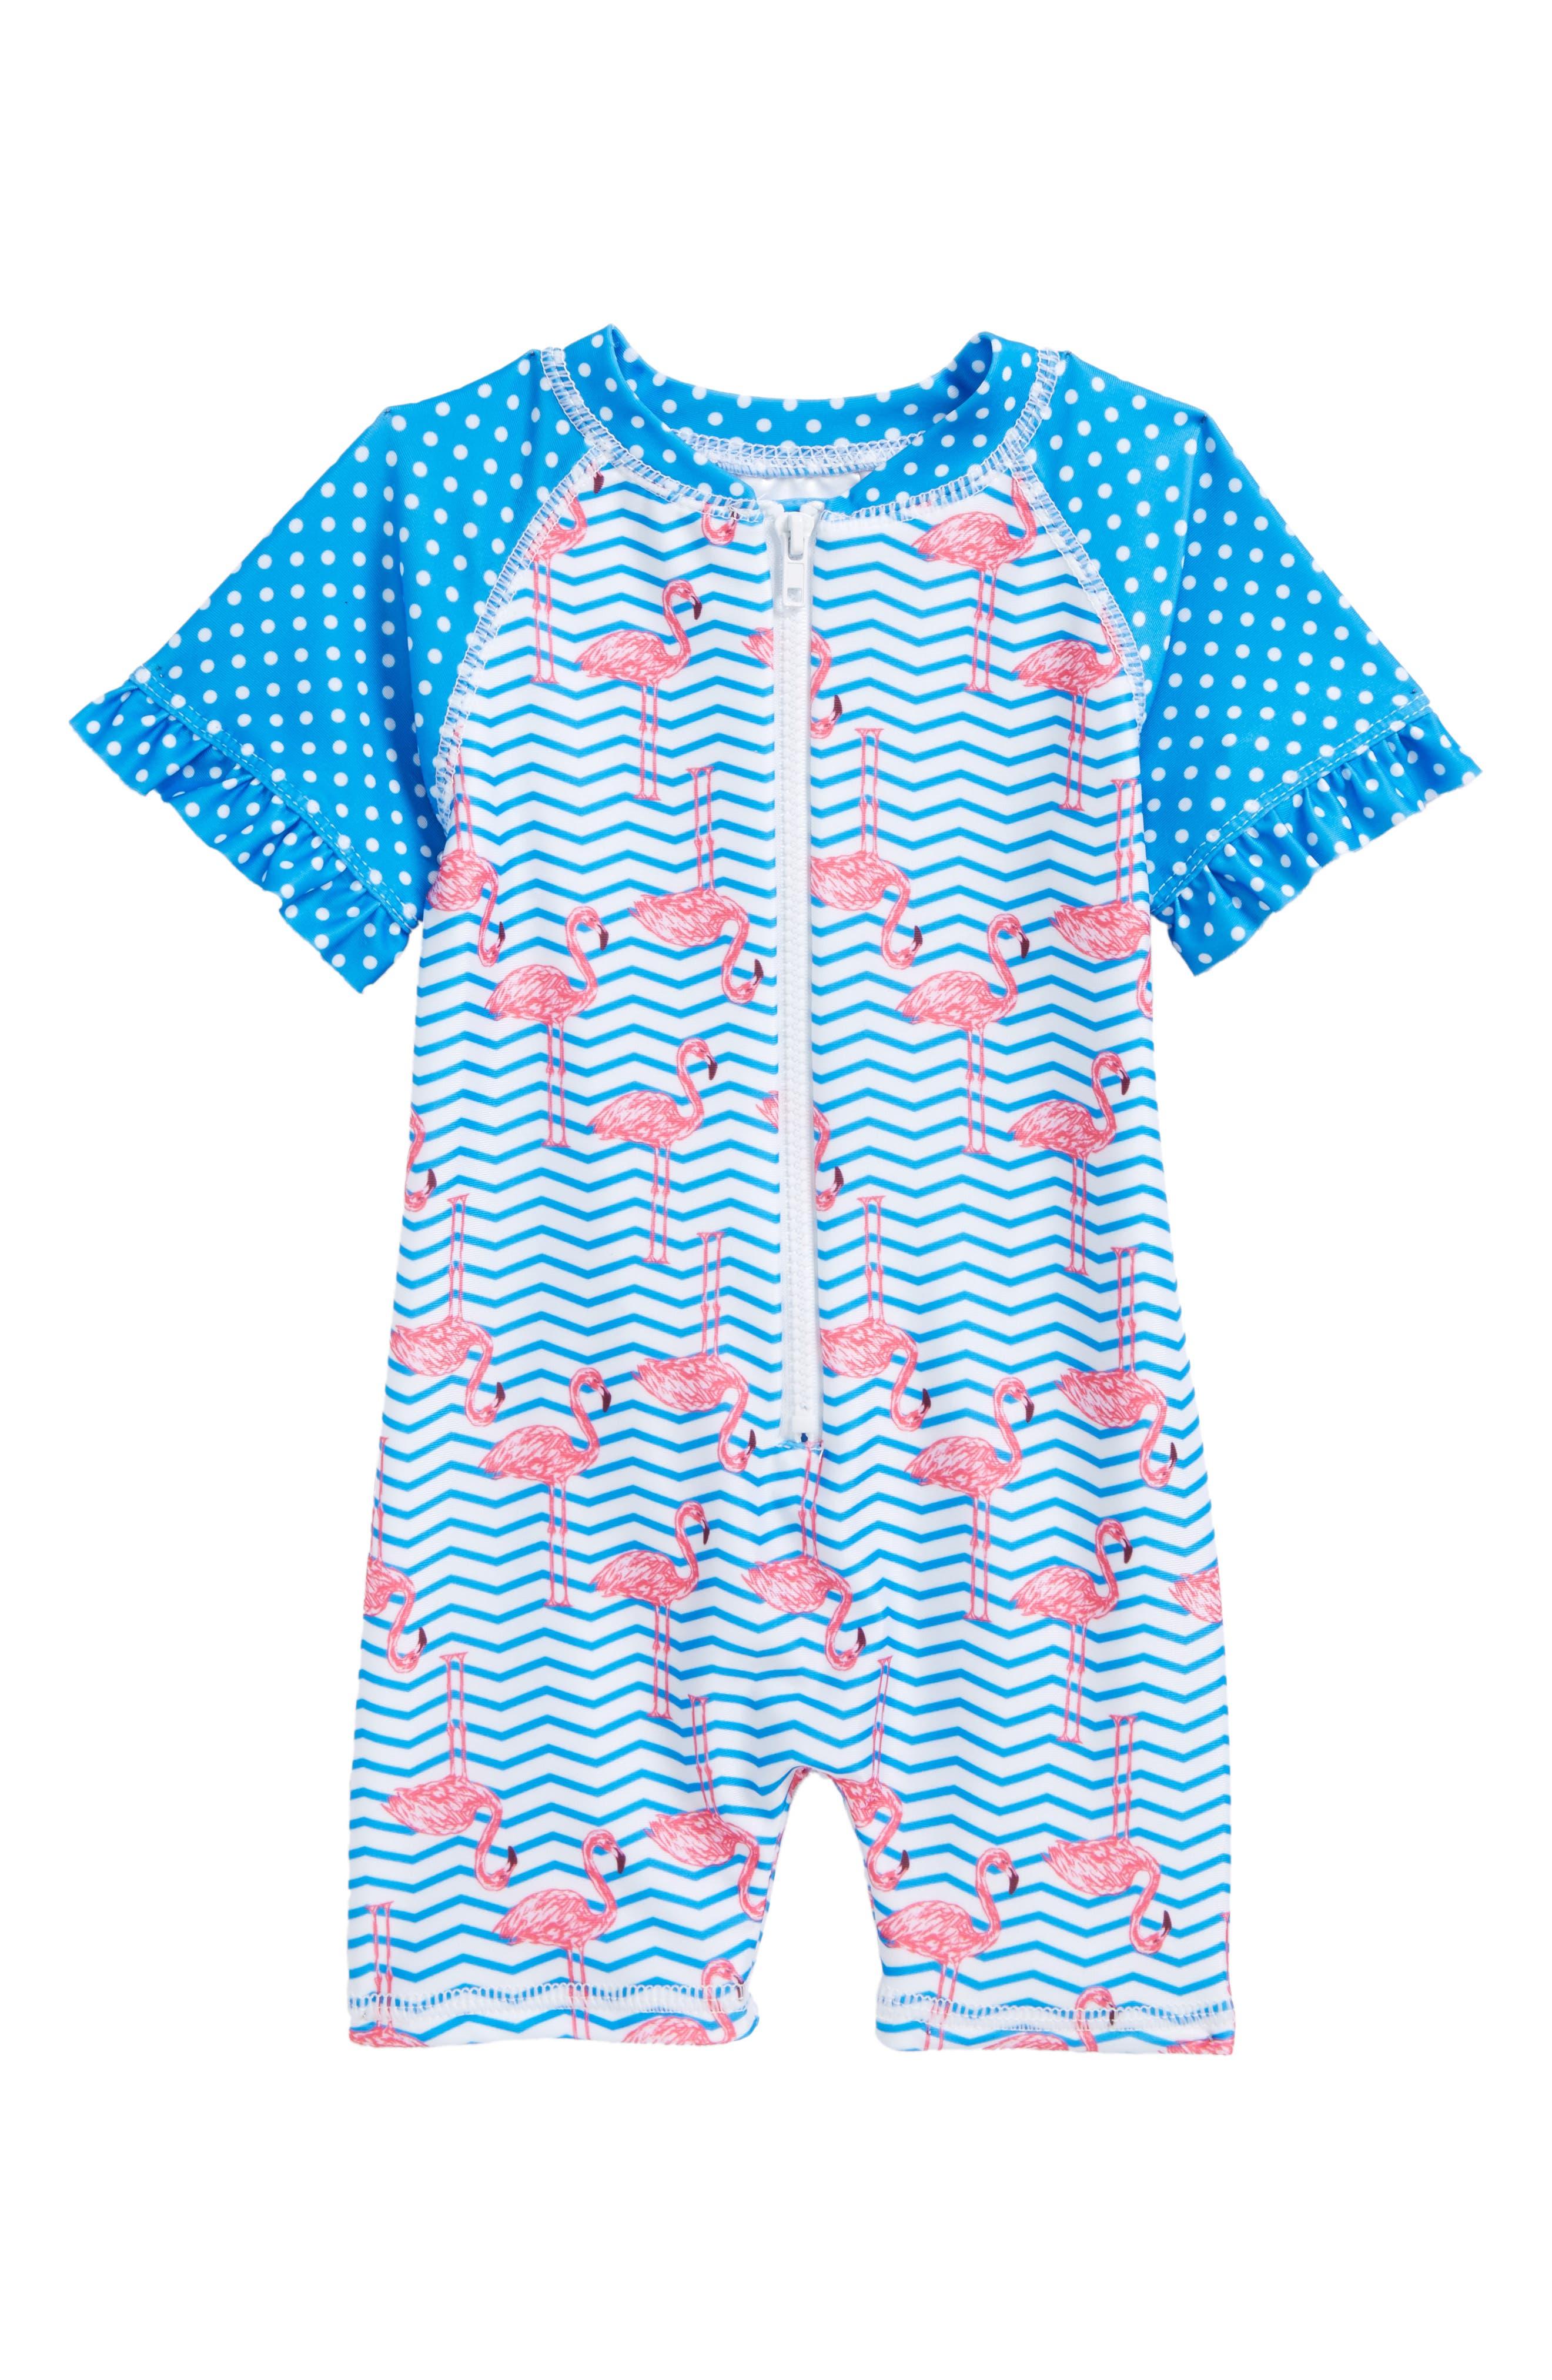 Zigzag Flamingos One-Piece Rashguard Swimsuit,                         Main,                         color, Blue Multi